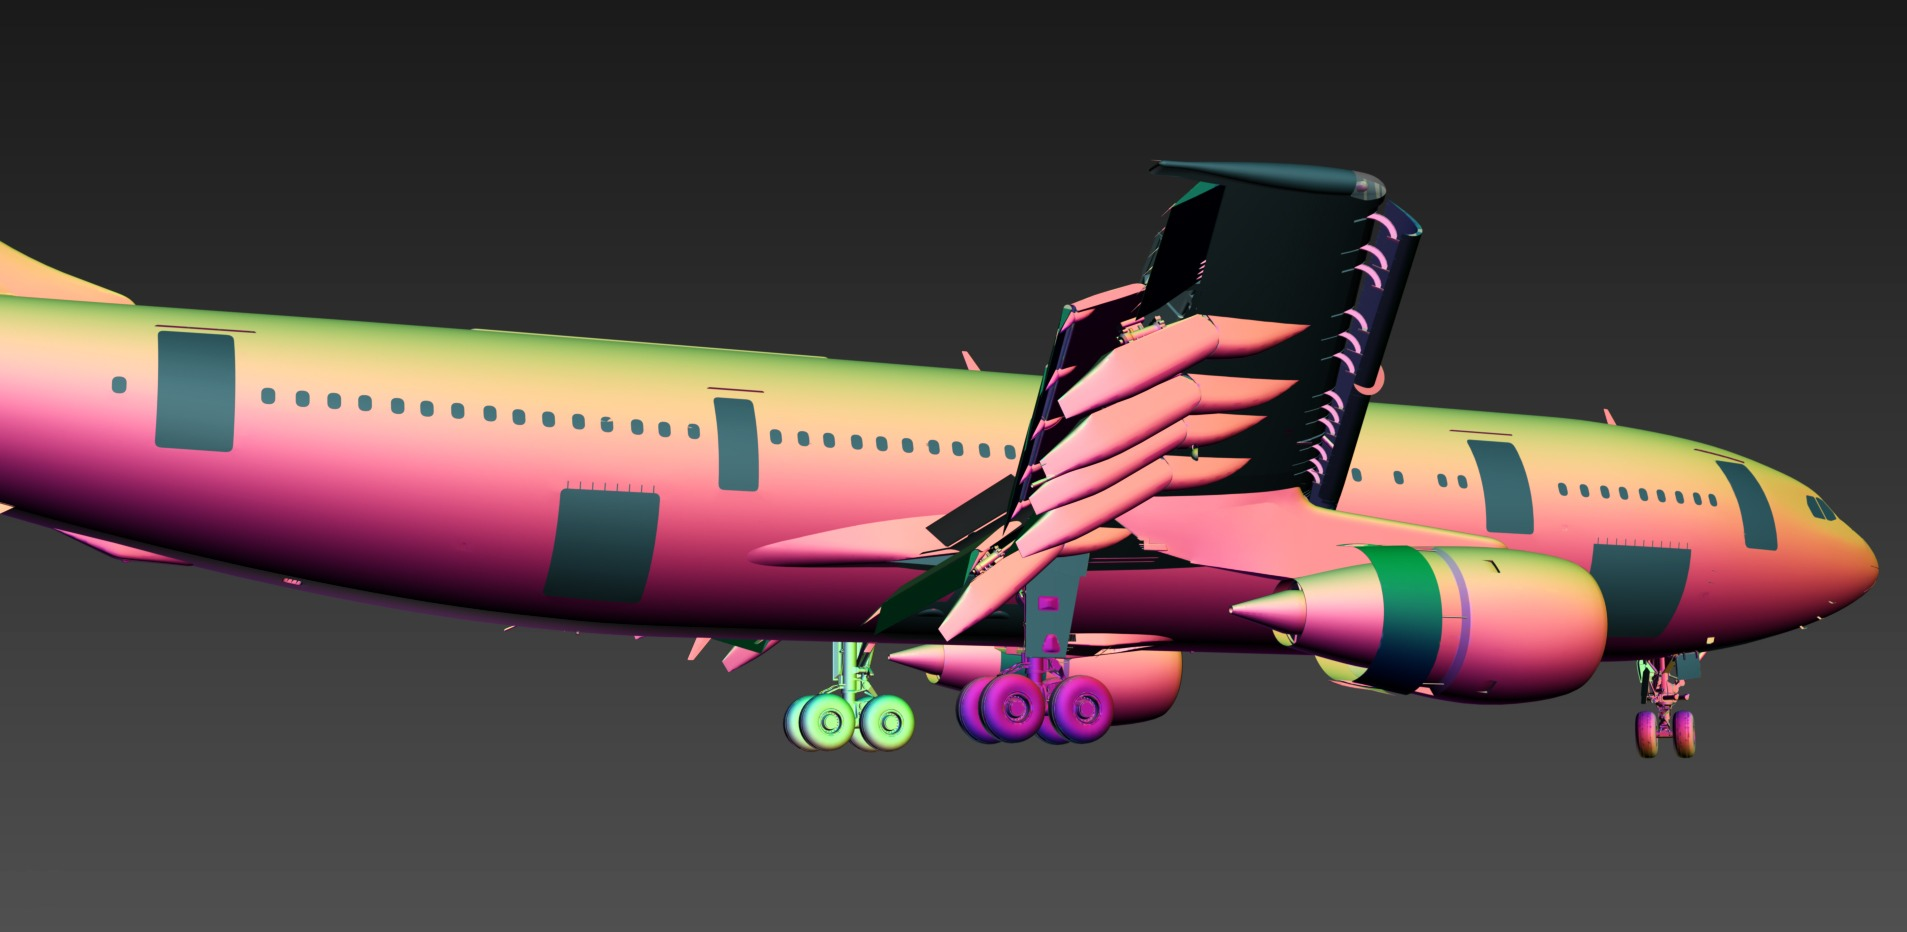 just-flight-a300-p3d-renders-2.jpg